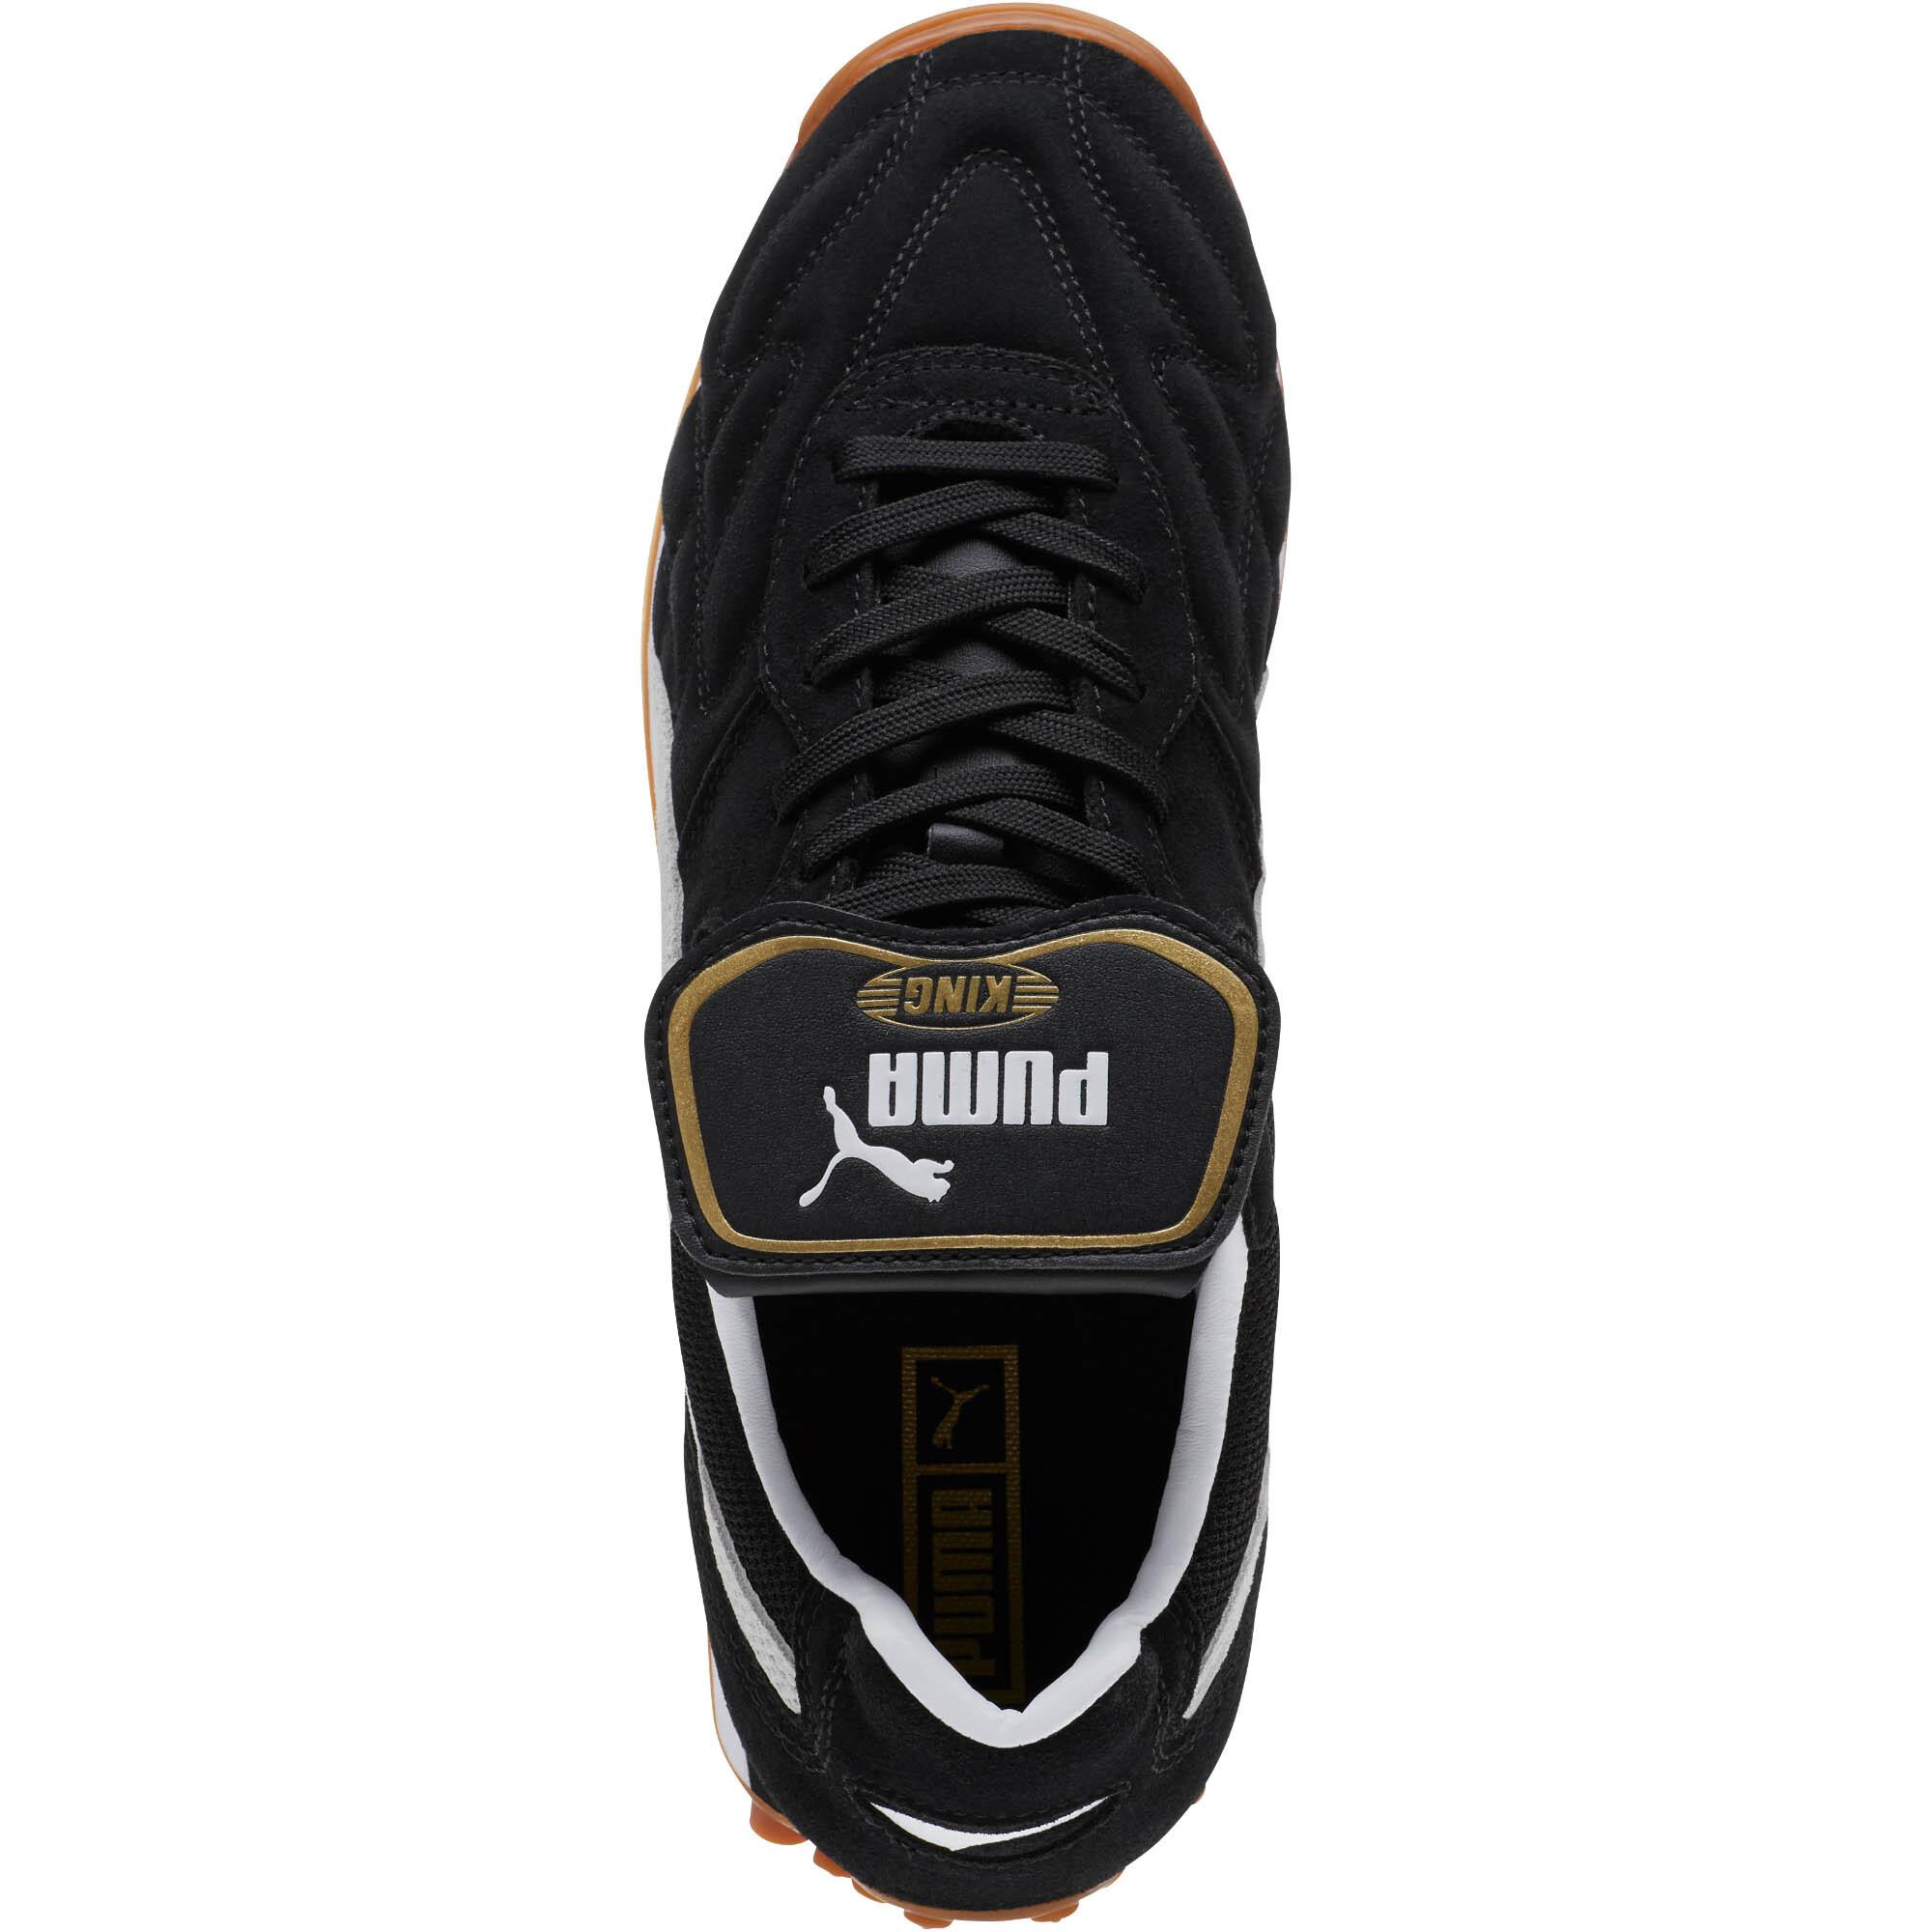 PUMA-King-Avanti-Soccer-Cleats-Unisex-Shoe-Sport-Classics thumbnail 6